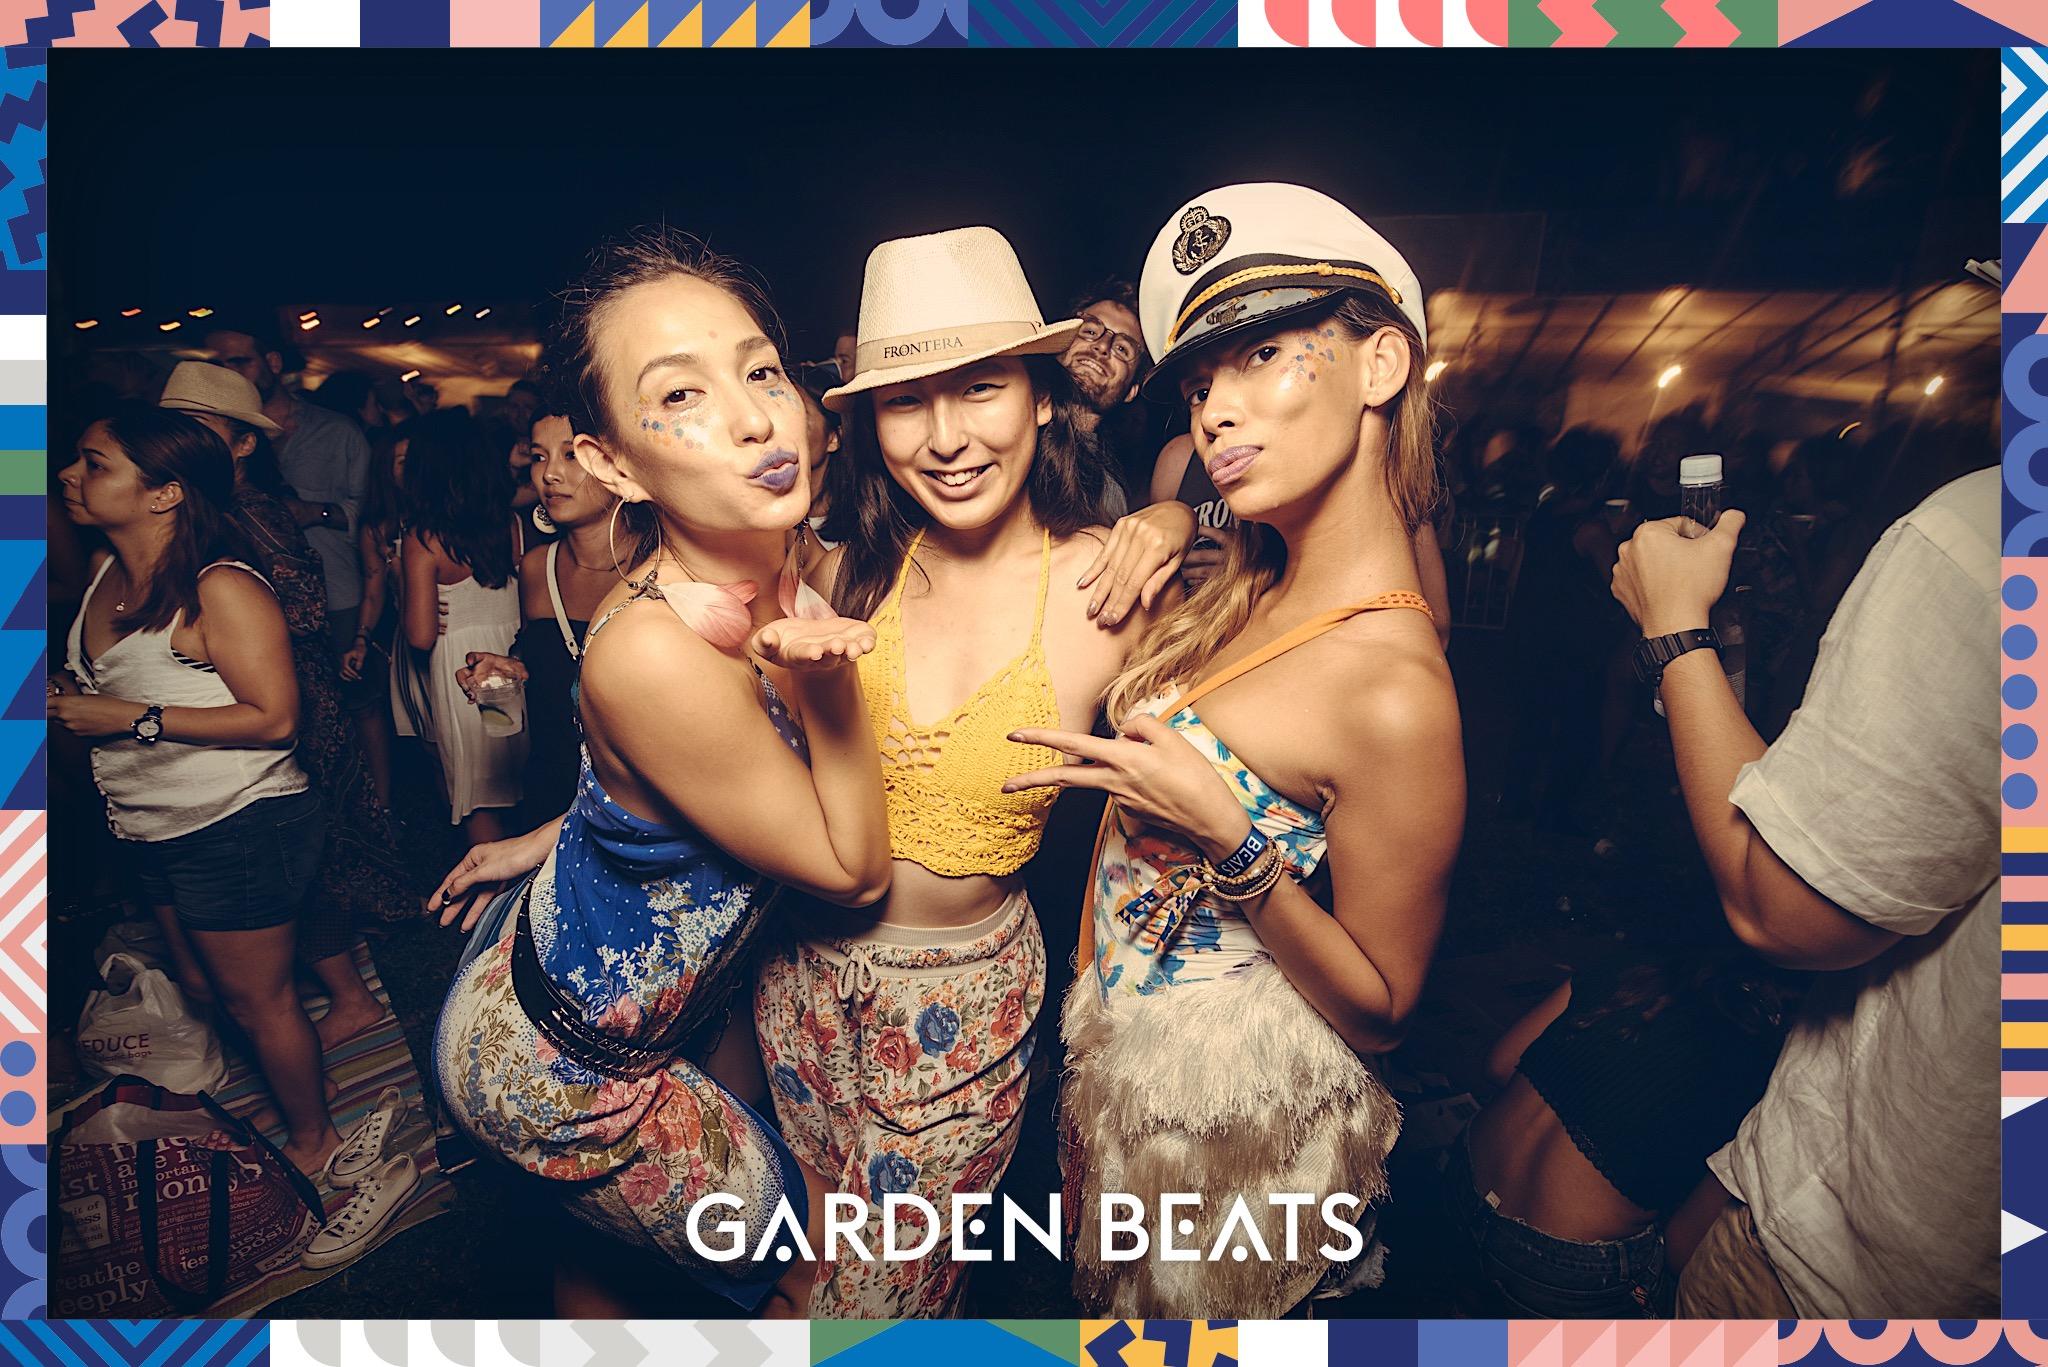 18032017_GardenBeats_Colossal807_WatermarkedGB.jpg